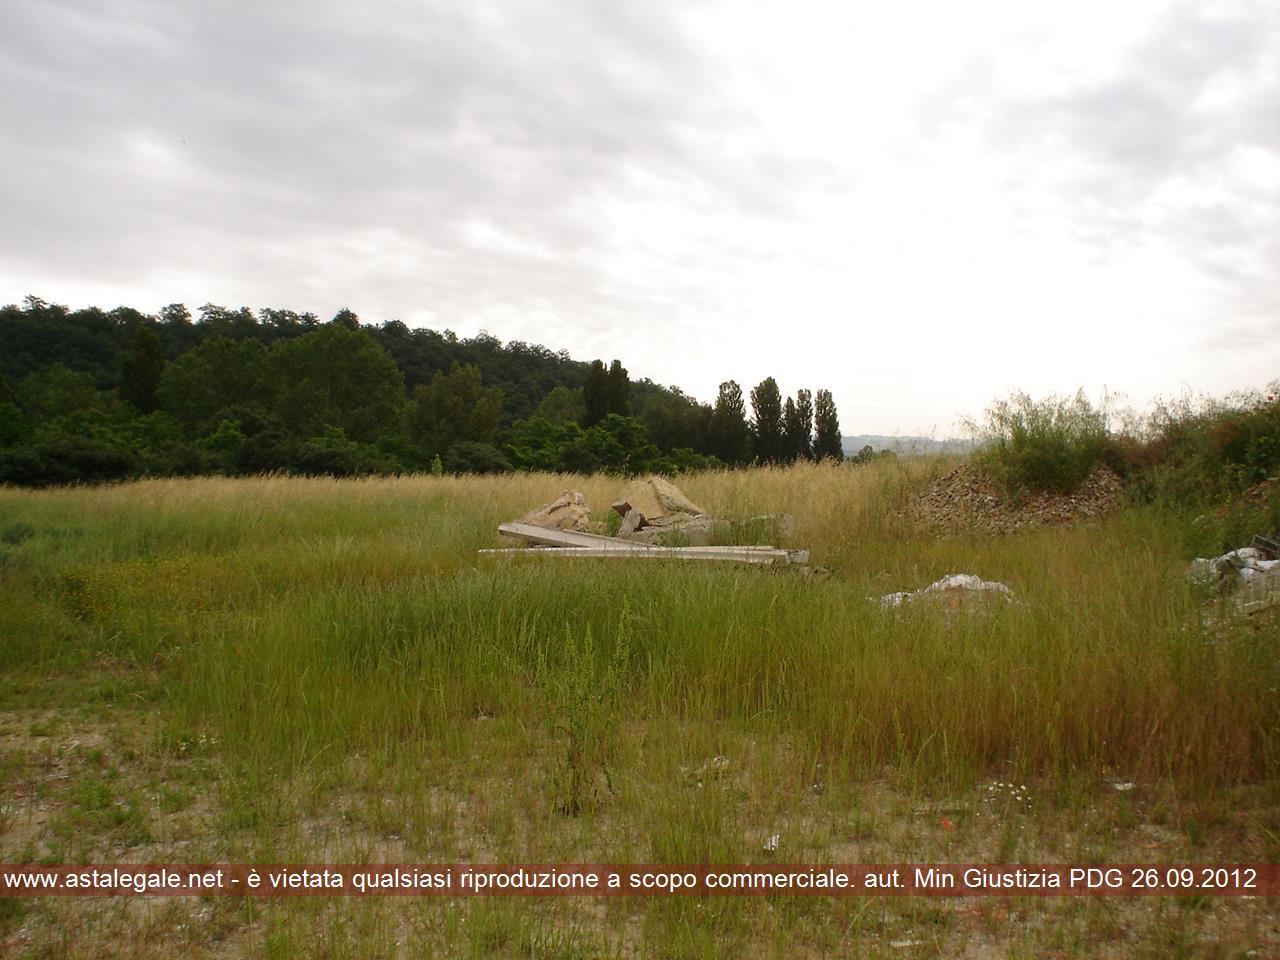 Umbertide (PG) Localita' Montecastelli - Via dell'Artigianato snc